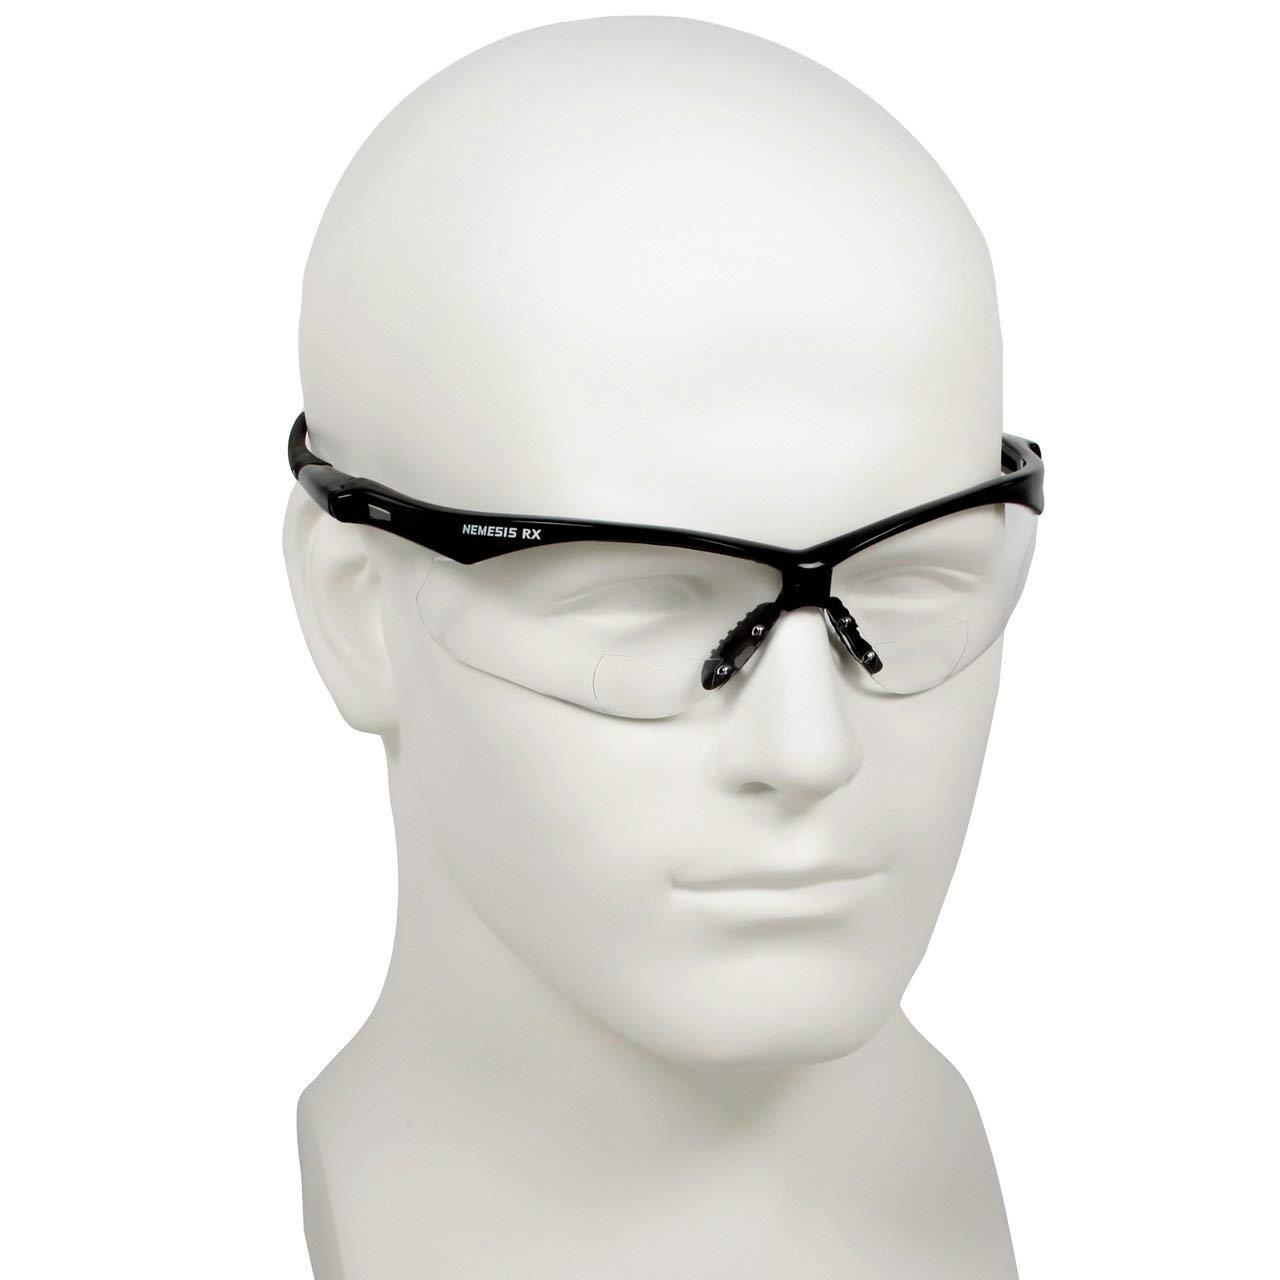 0a9532d7847 Get Quotations · Jackson Nemesis Bifocal Safety Glasses - Black Frame 1.0  Clear Lens